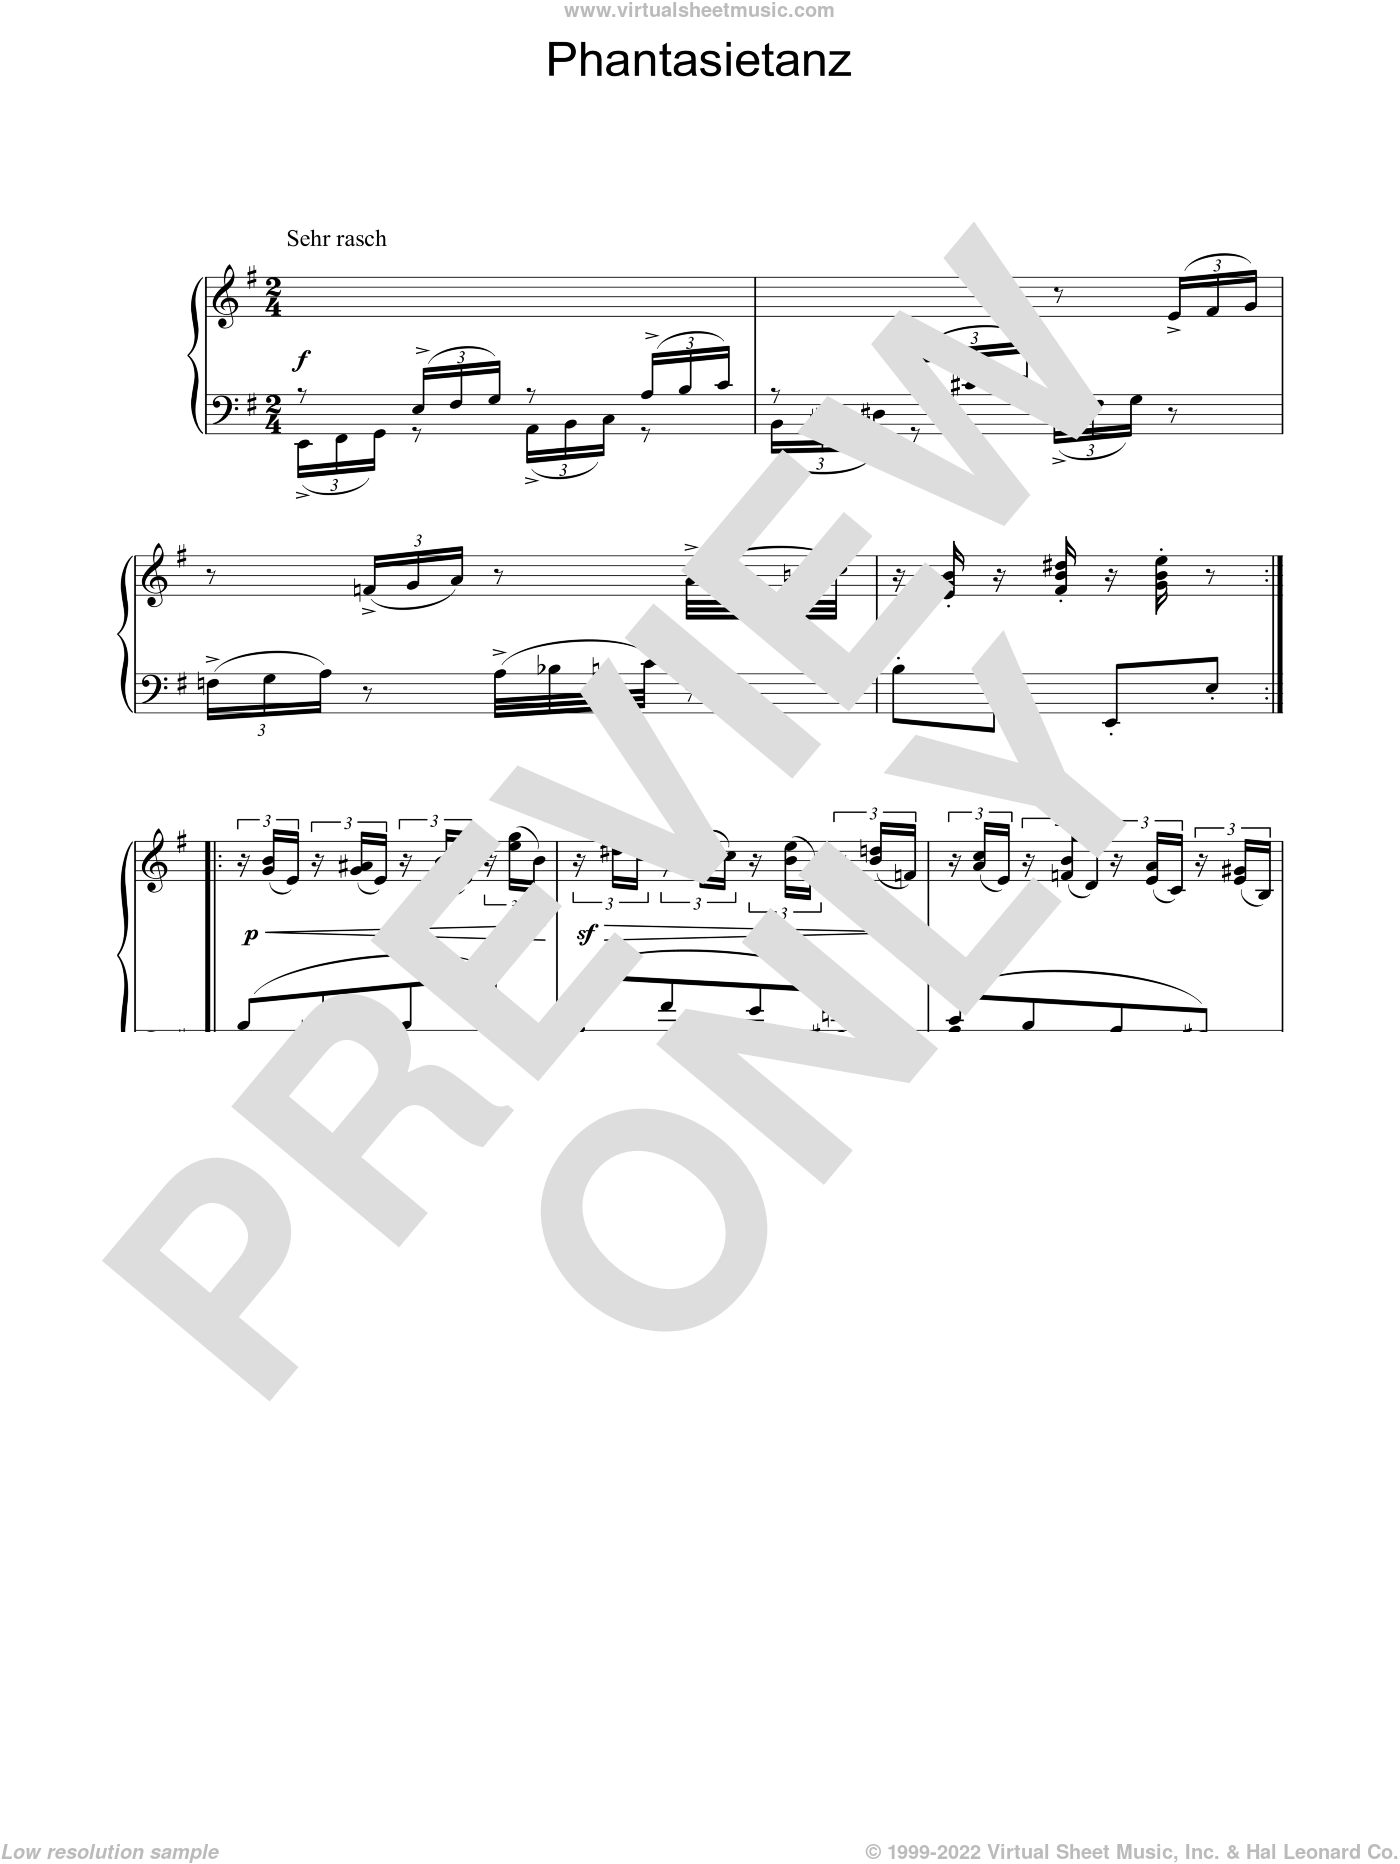 Phantasietanz sheet music for piano solo by Robert Schumann, classical score, intermediate skill level